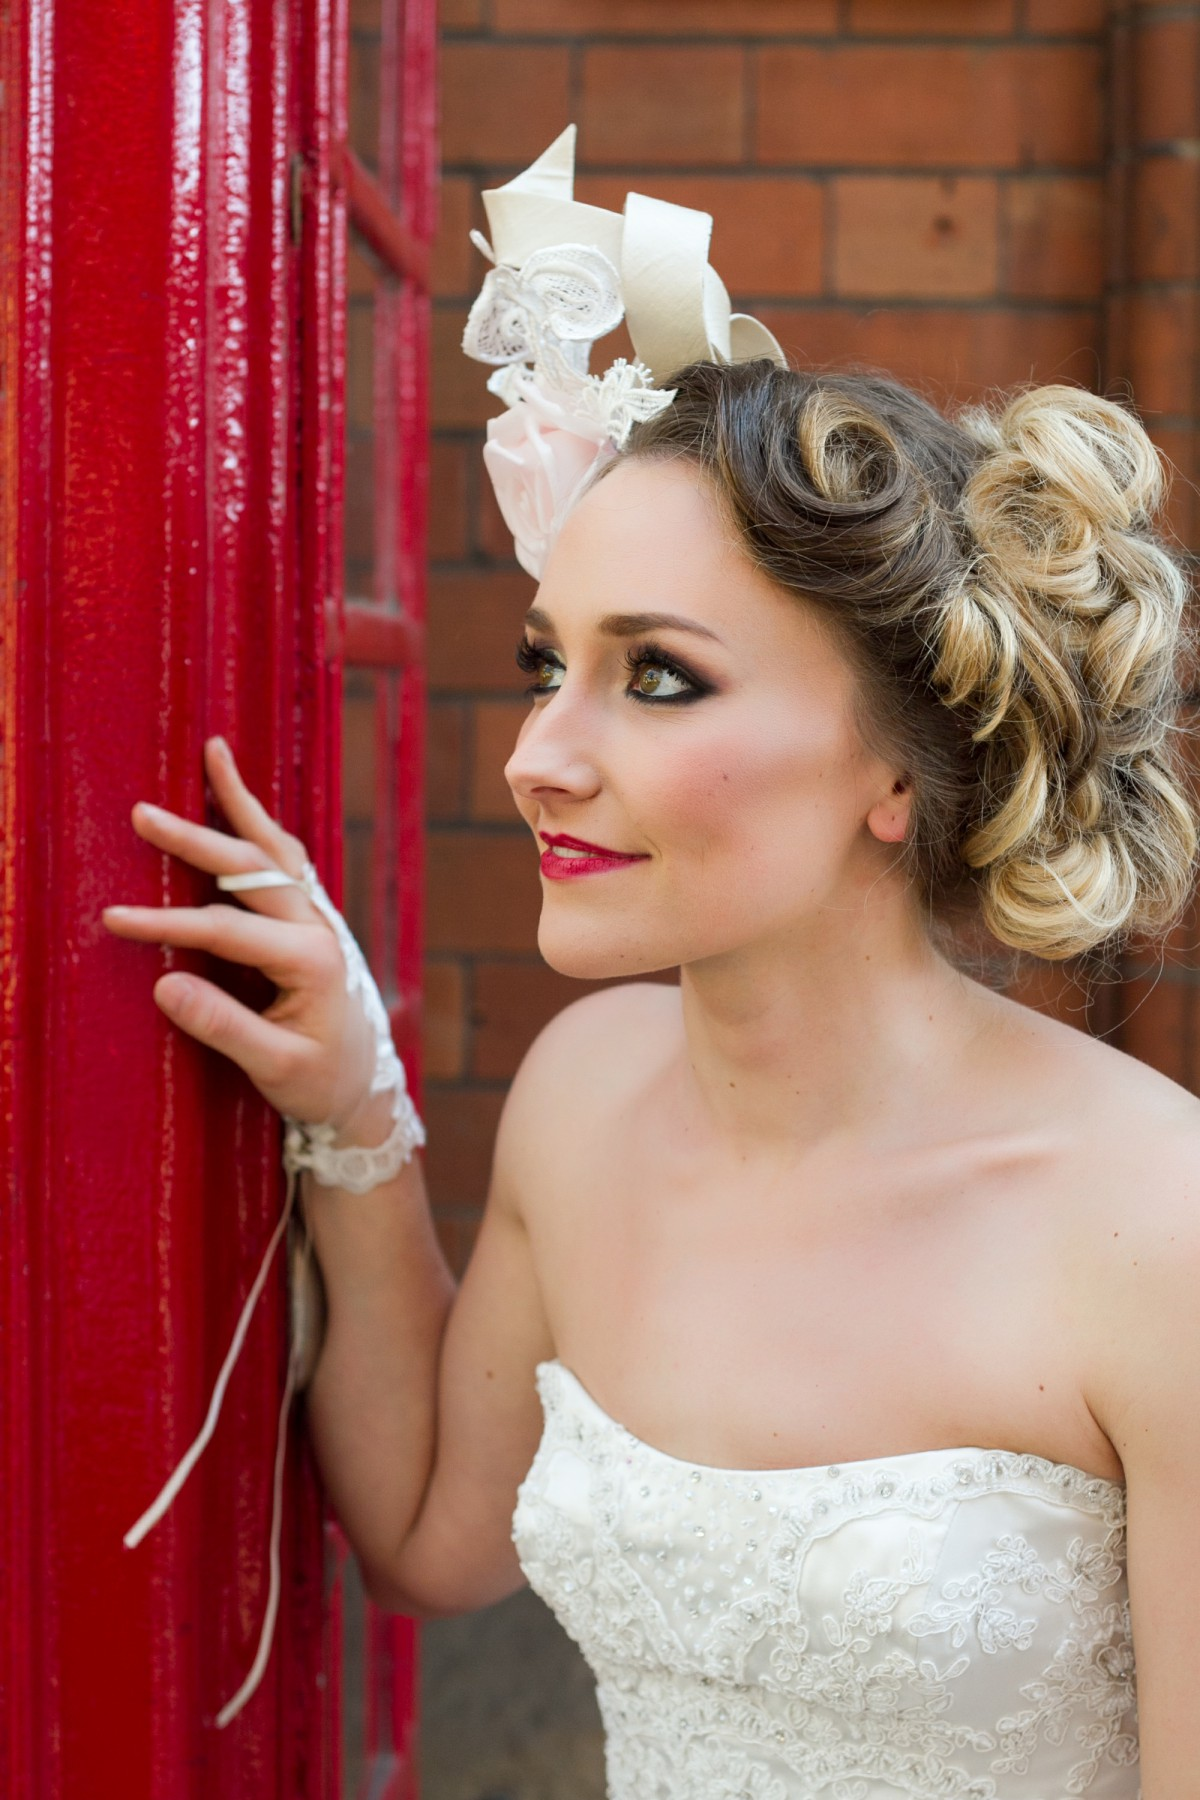 Iso Elegant Photography - Leicester wedding network - Railway wedding - vintage wedding 23